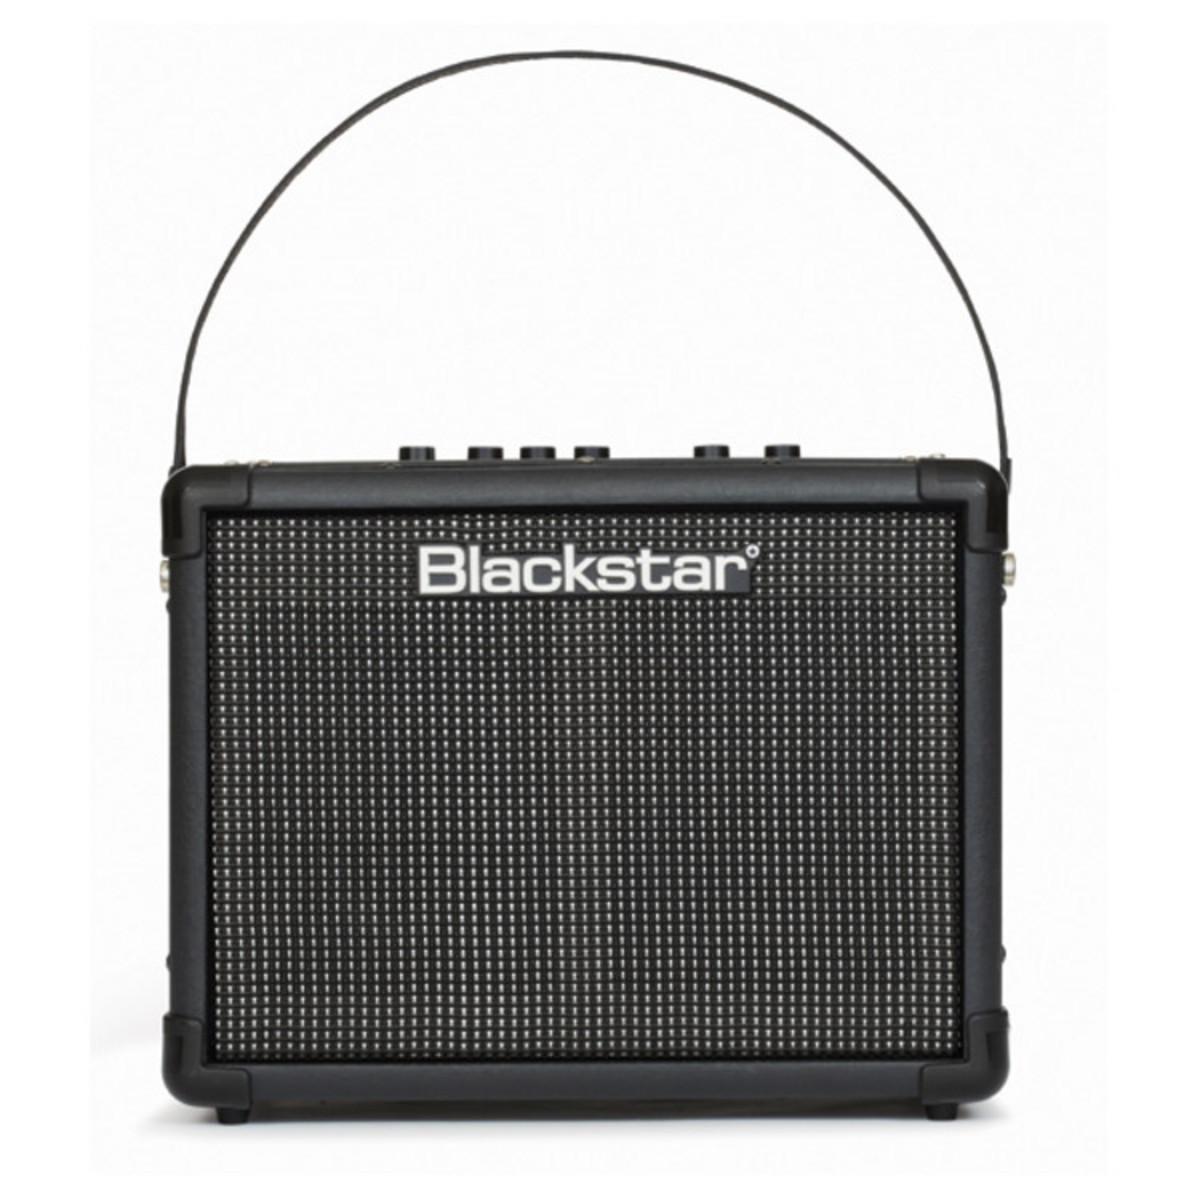 blackstar id core 10 stereo 10 watt 2x5w combo amp at. Black Bedroom Furniture Sets. Home Design Ideas